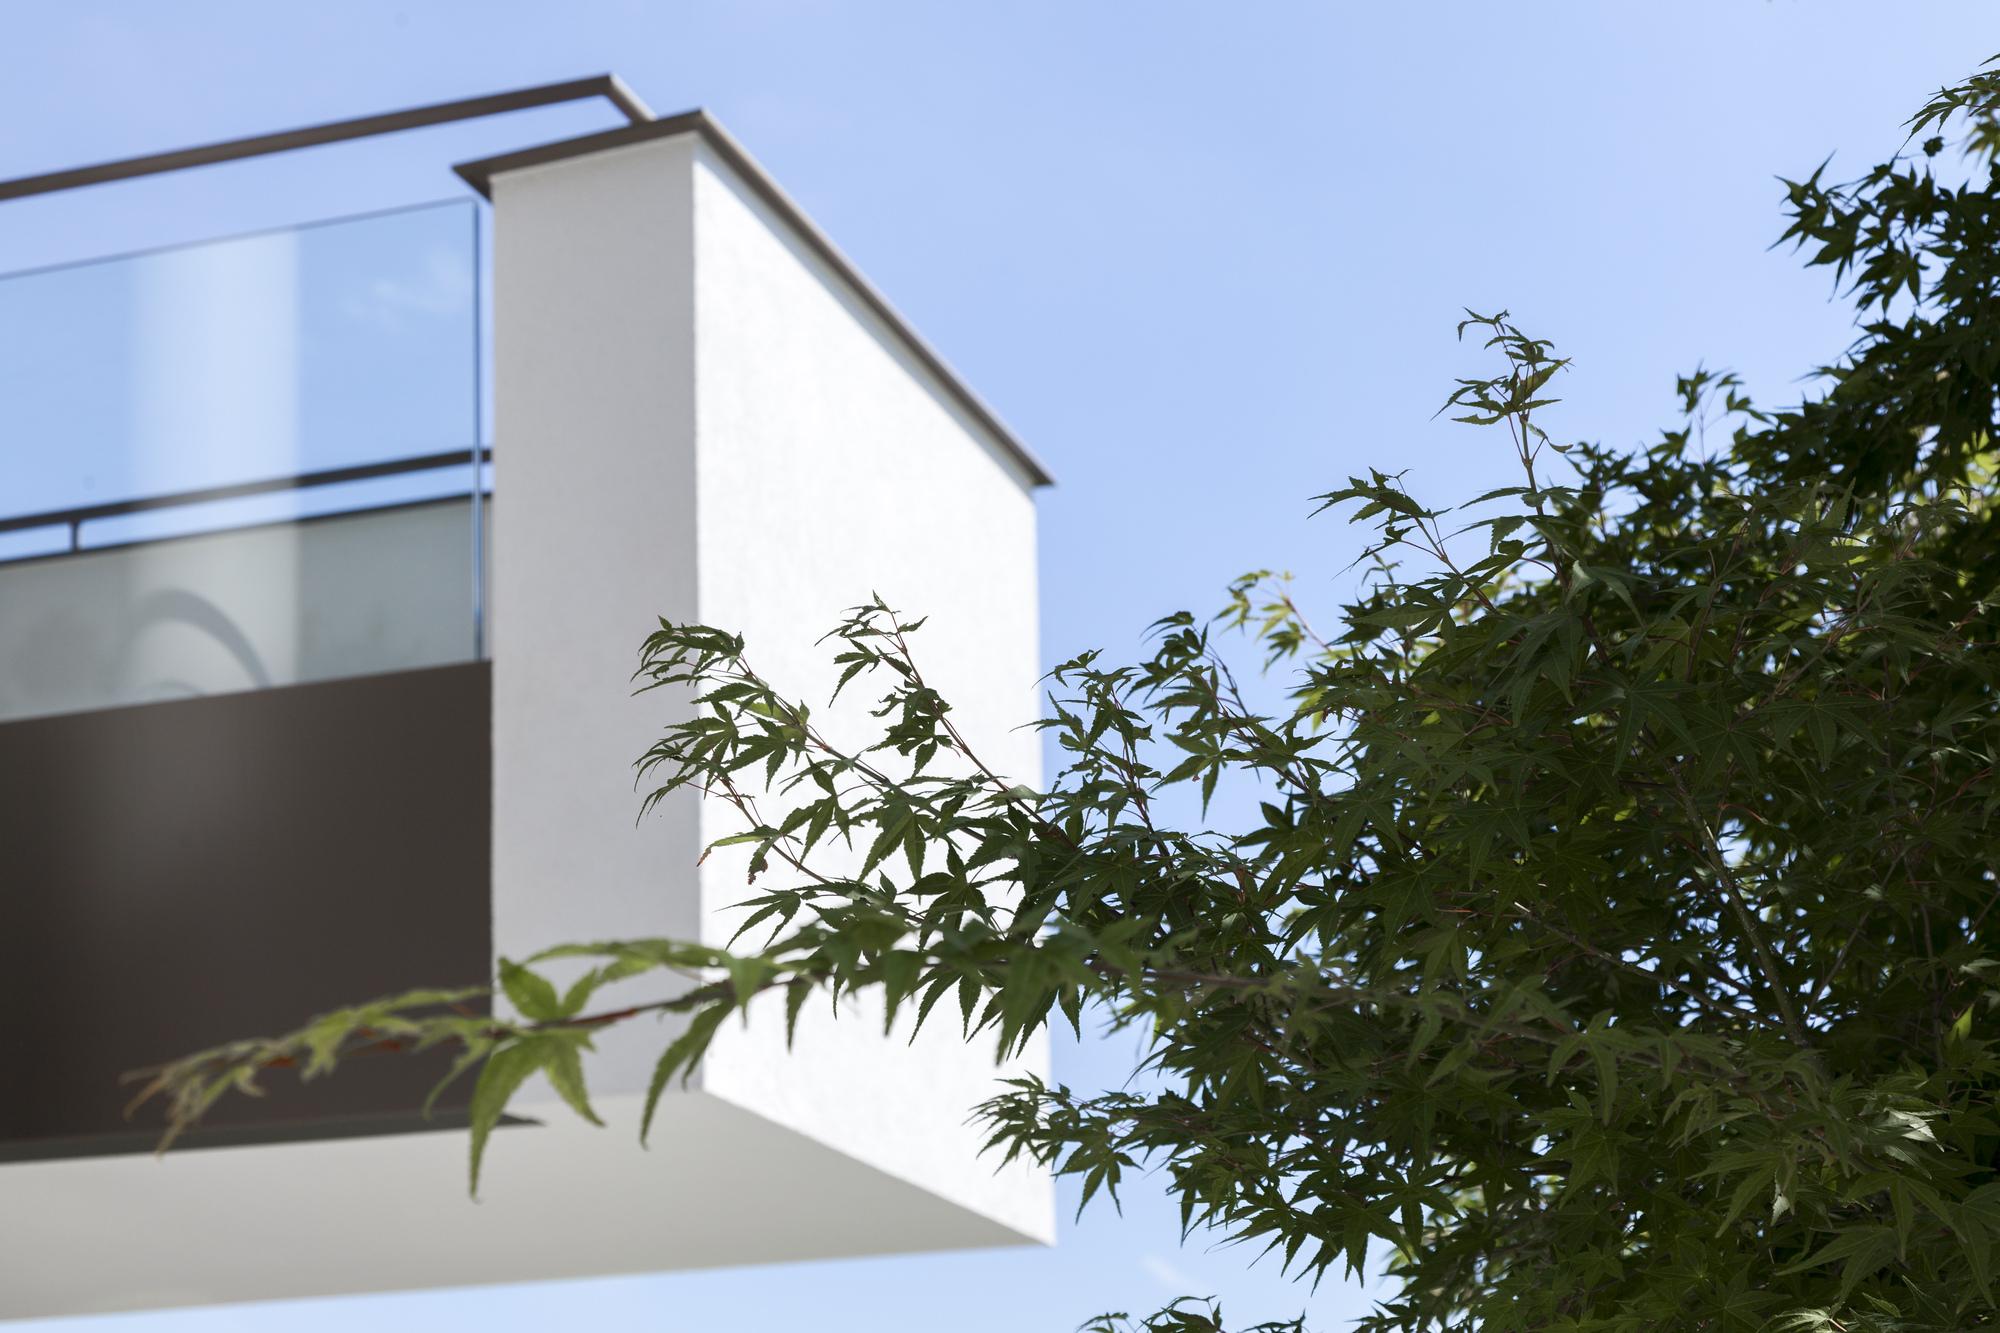 Galer a de casa fmb fuchs wacker architekten 21 - Fmb architekten ...